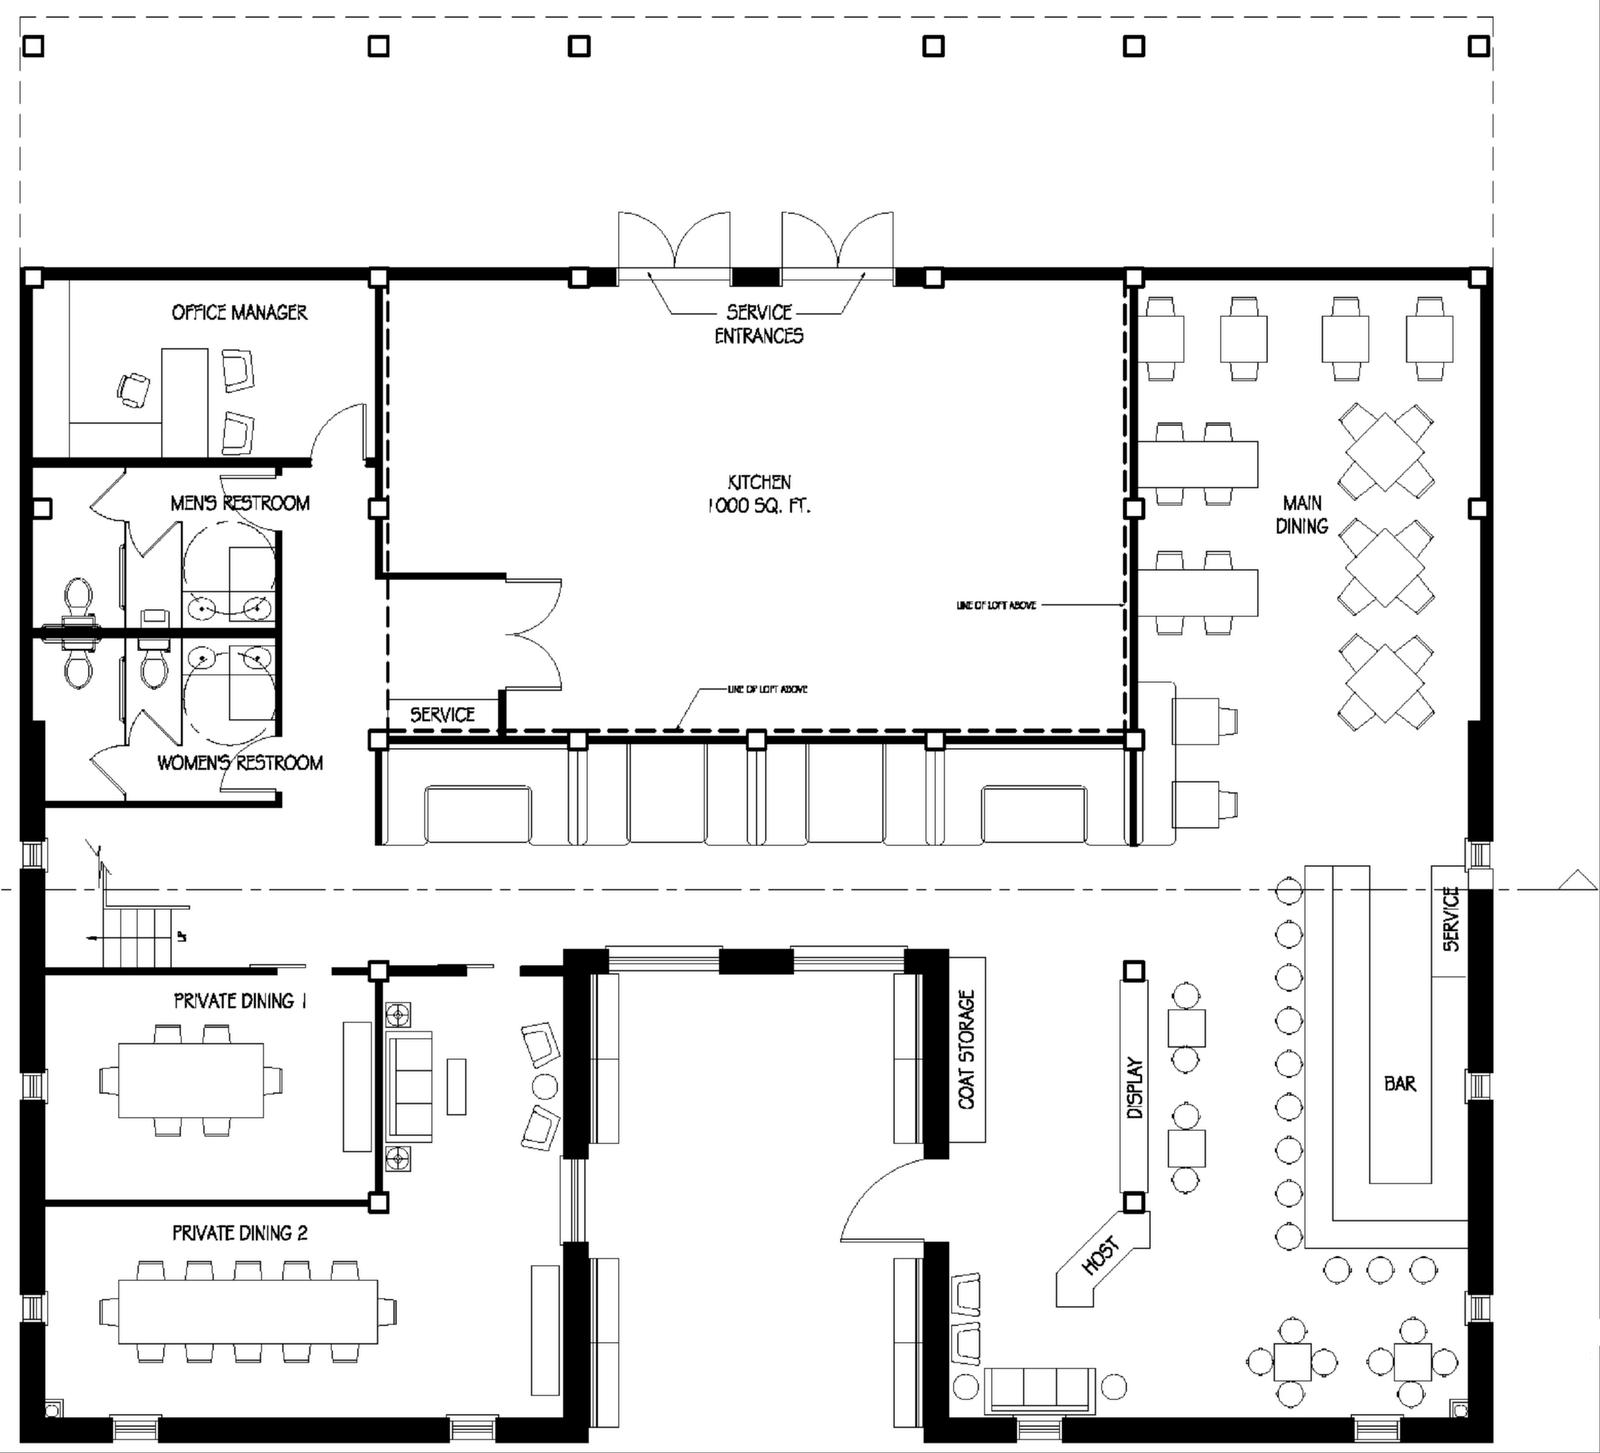 Pin By Rohman Al On Game Stuff Restaurant Floor Plan Restaurant Flooring Simple Floor Plans